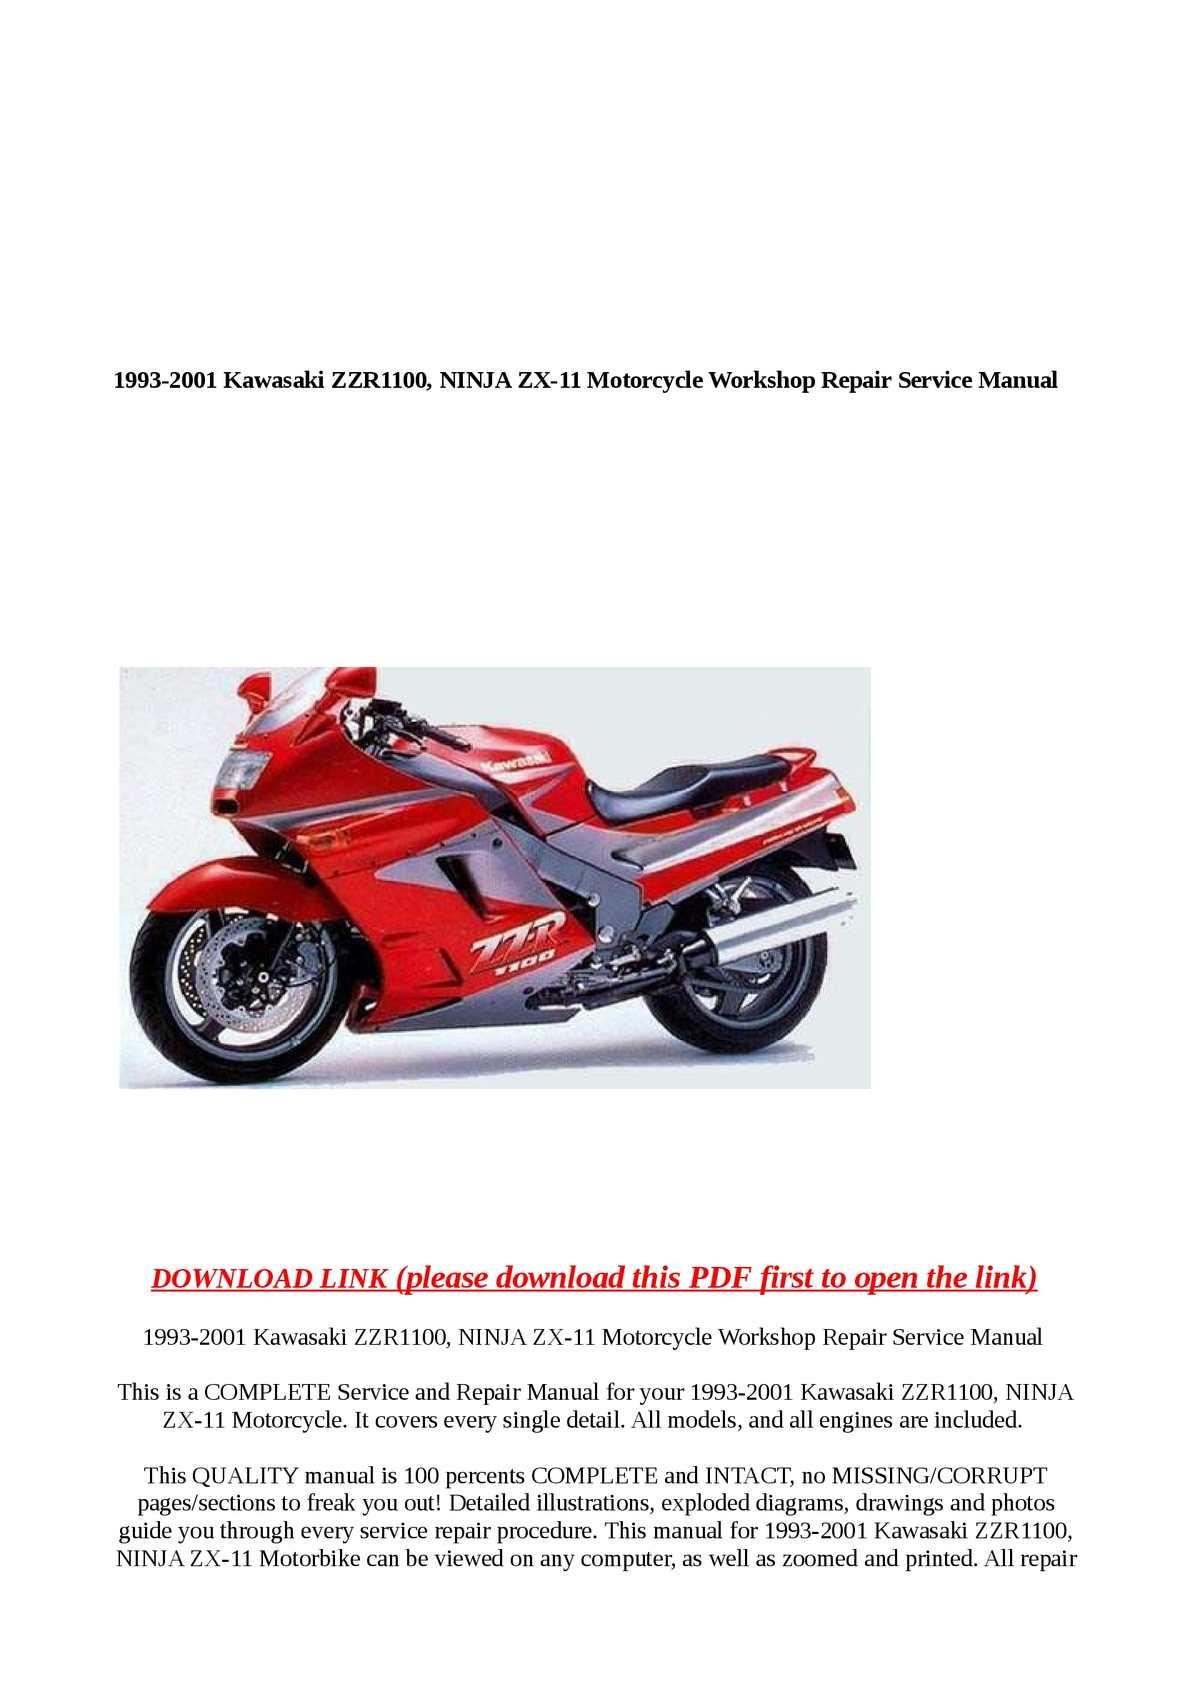 Zx11 Wiring Diagram Schematic Diagrams 1996 Kawasaki 1100 Ninja Calamo 1993 2001 Zzr1100 Zx 11 Motorcycle 92